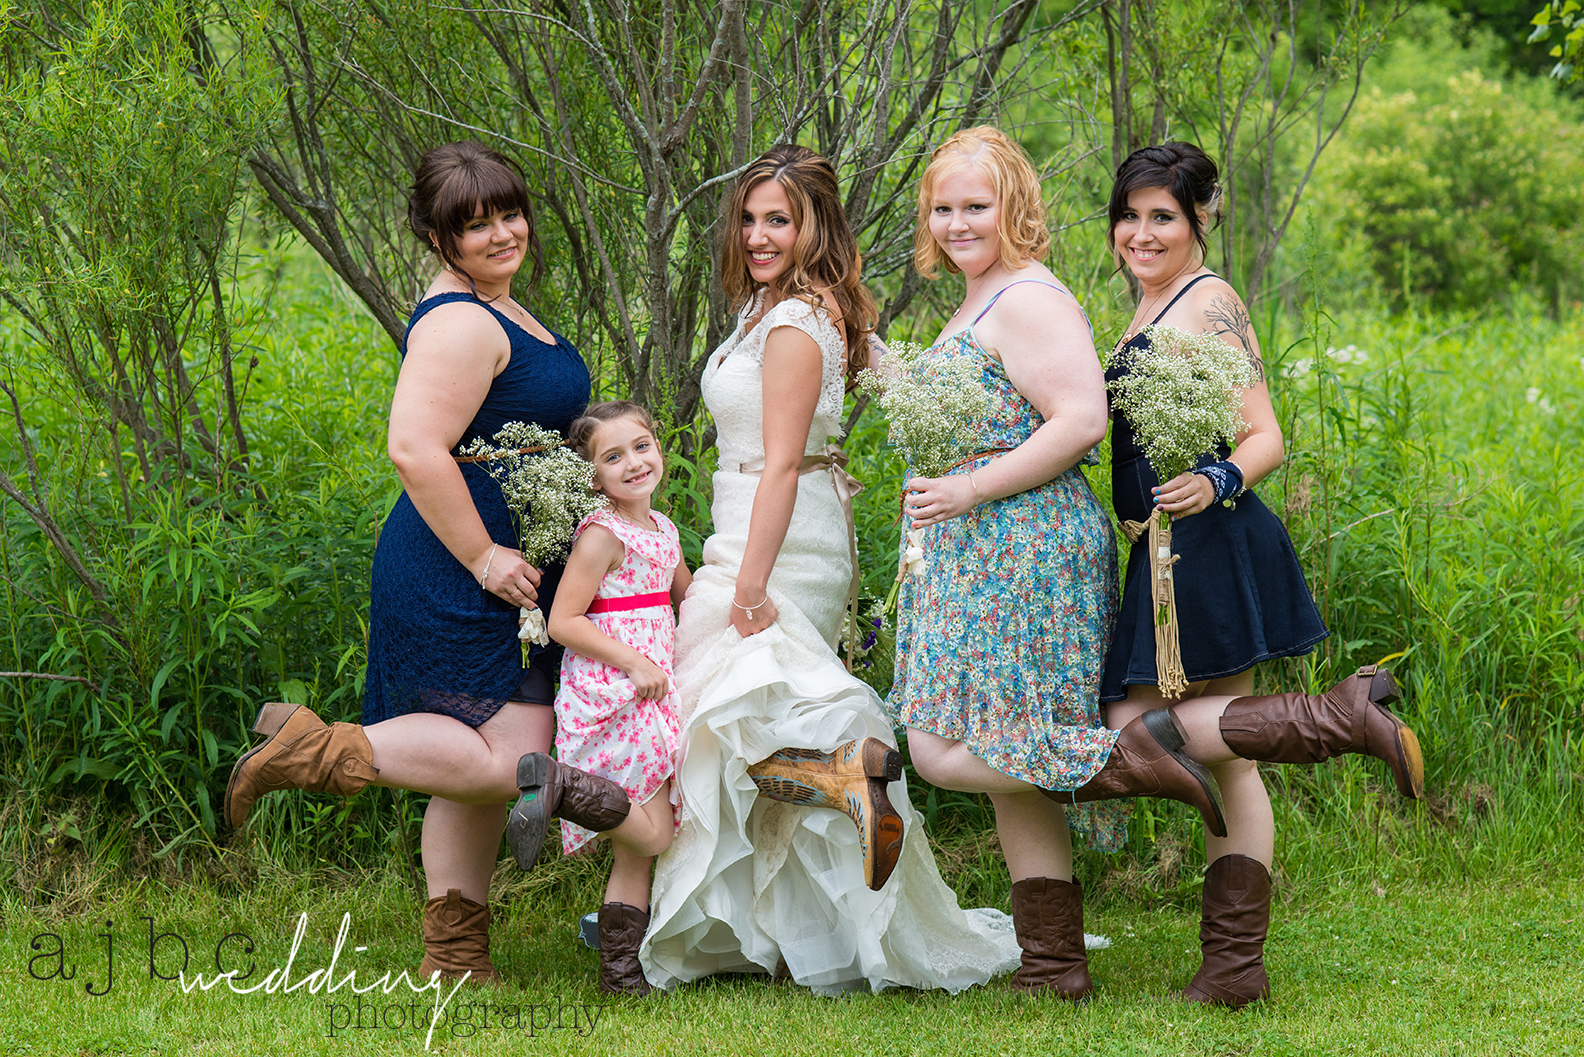 ajbcphotography-port-huron-michigan-wedding-photographer-outdoors-summer-wedding-country-wedding-wadhams-michigan-bride-vintage-wedding-bridesmaids.jpg